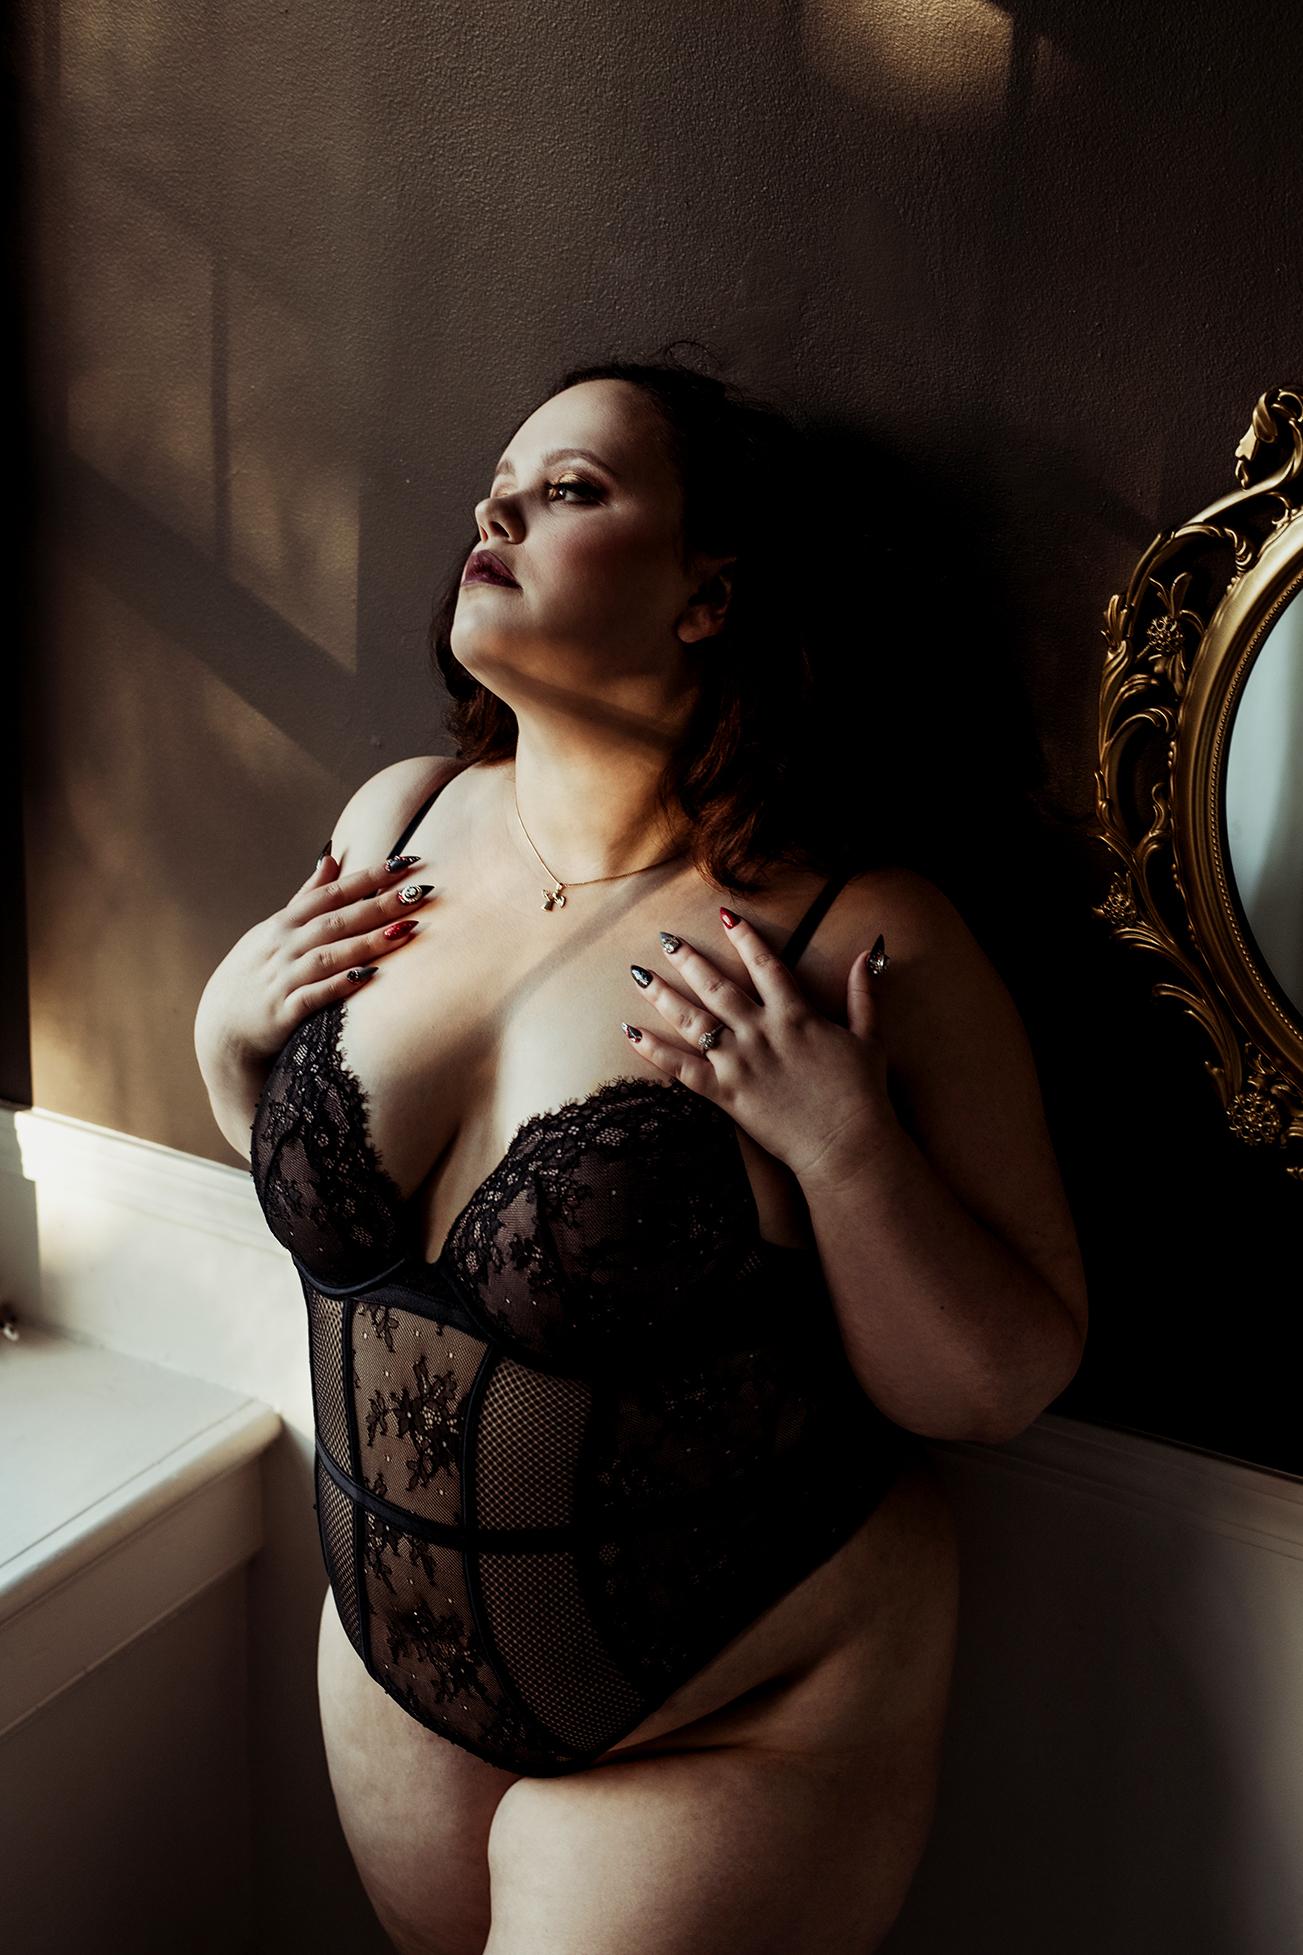 Victoria-BC-Boudoir-Photography-8.jpg